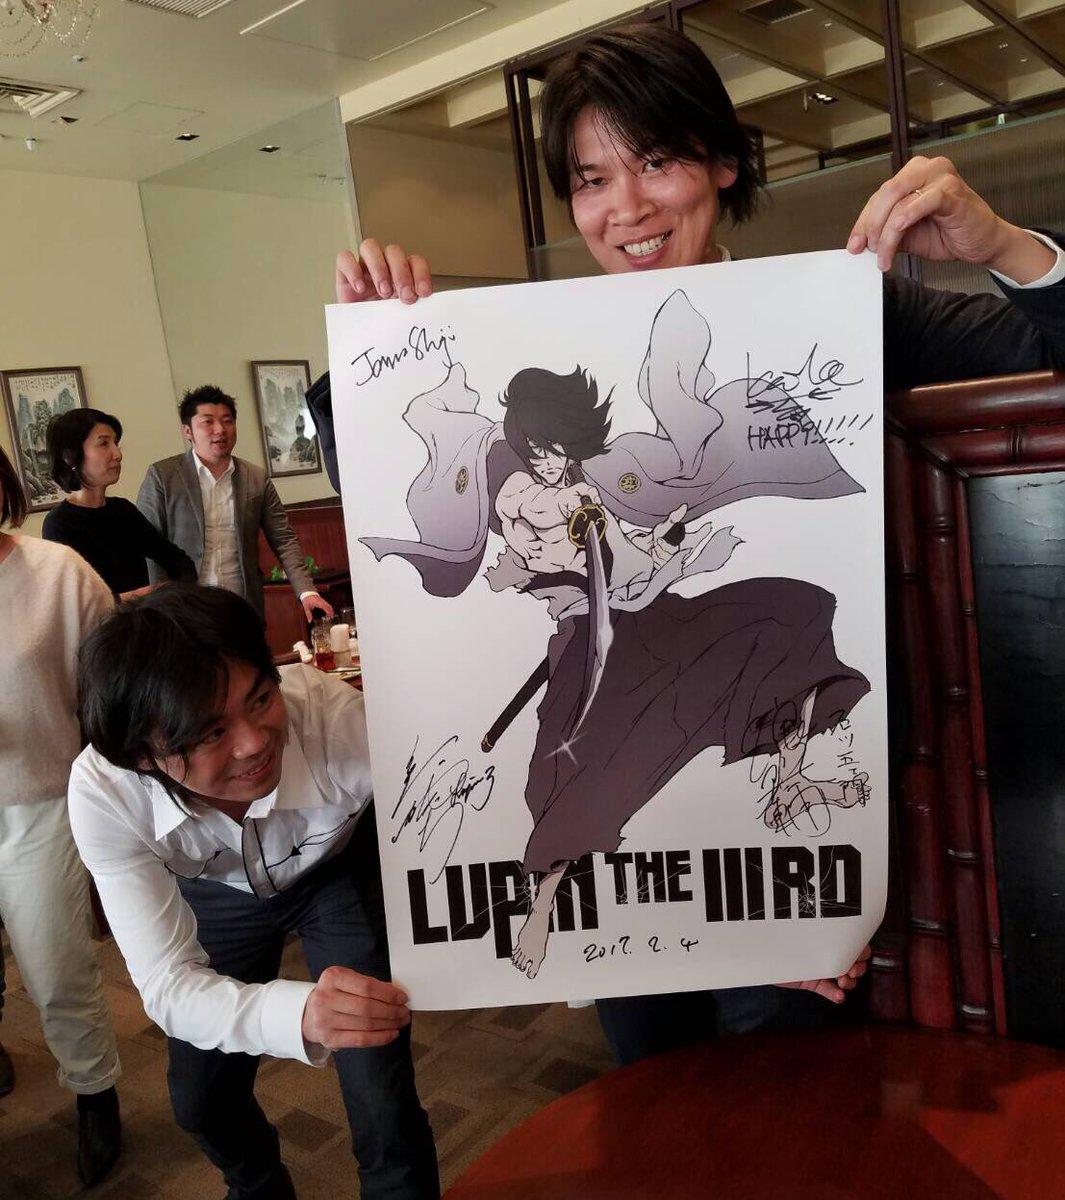 「LUPIN THE IIIRD 血煙の石川五ェ門」公開初日舞台挨拶にお越しくださった皆さま、ありが…